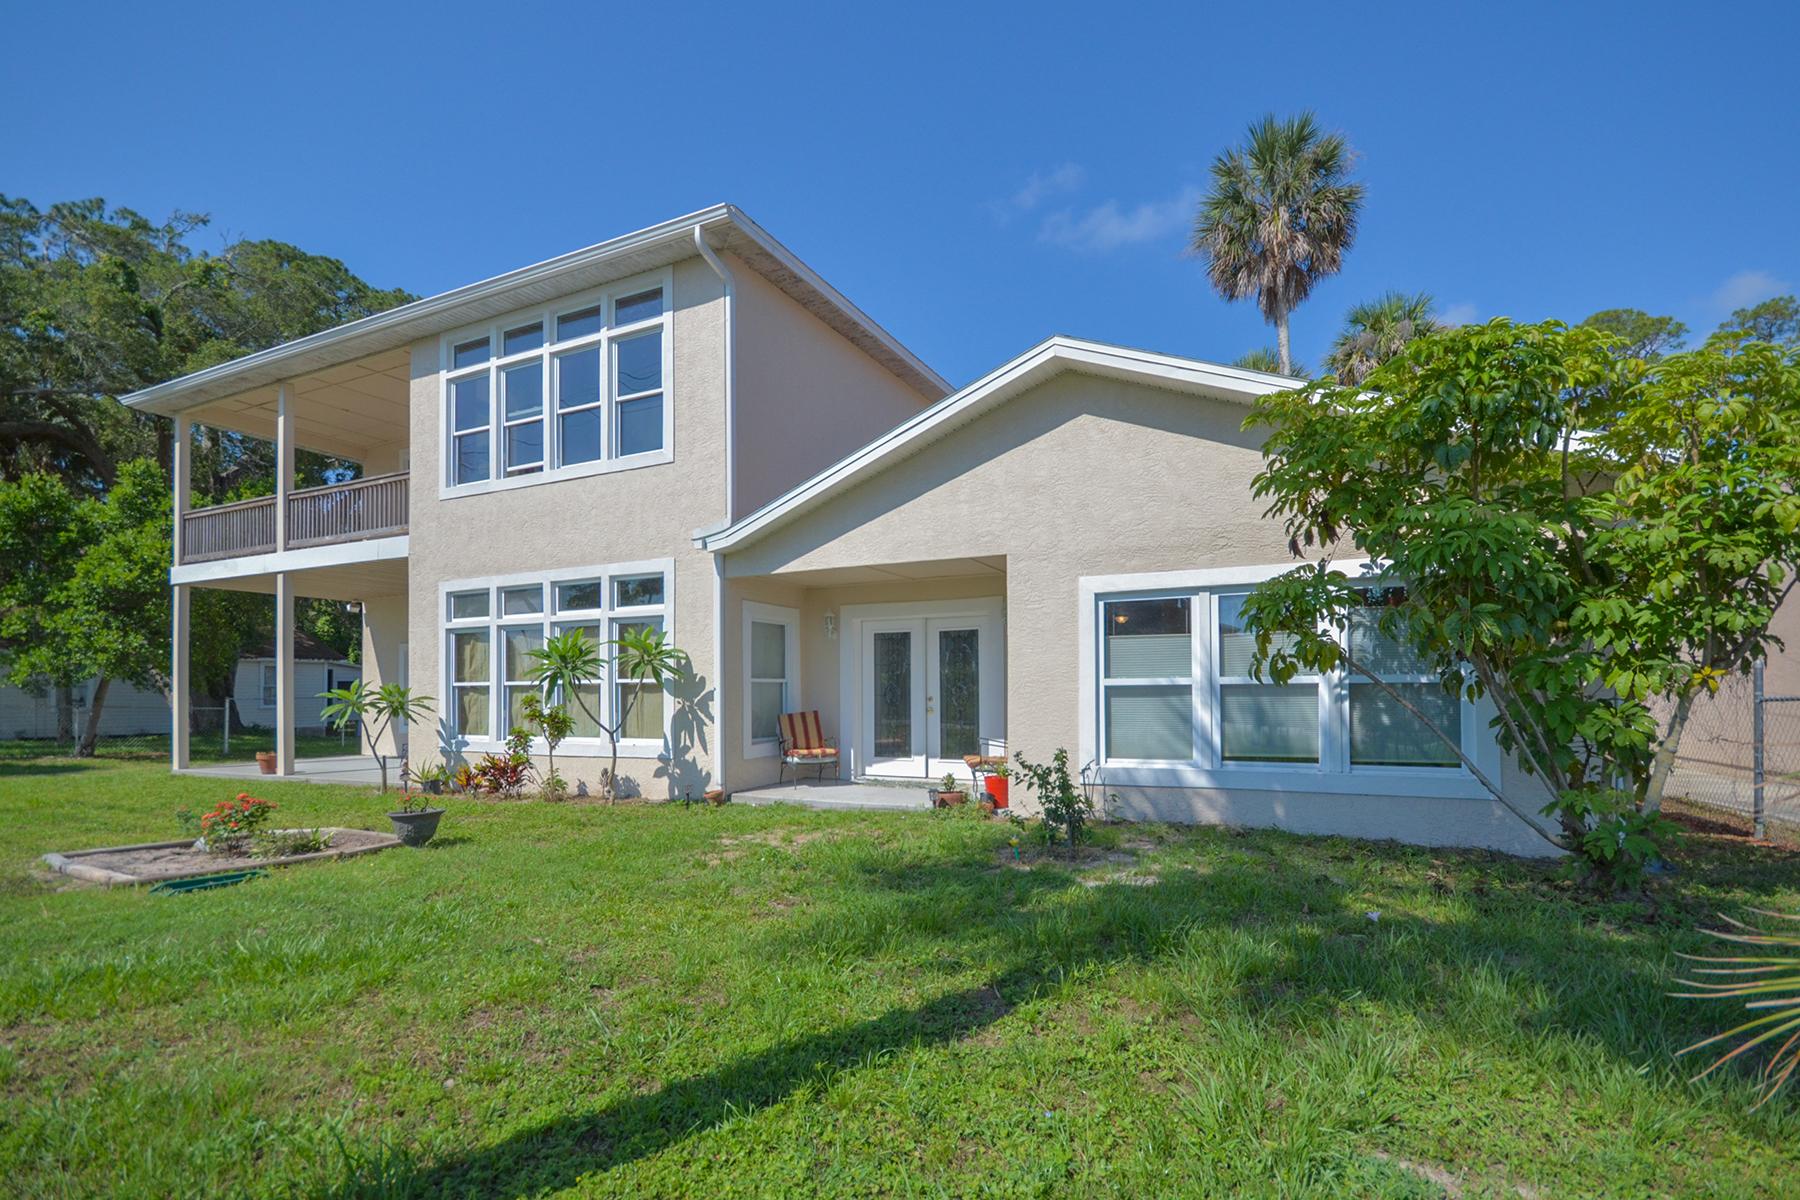 Частный односемейный дом для того Продажа на LAKE MARY - HOLLY HILL 1618 Riverside Dr Holly Hill, Флорида, 32117 Соединенные Штаты